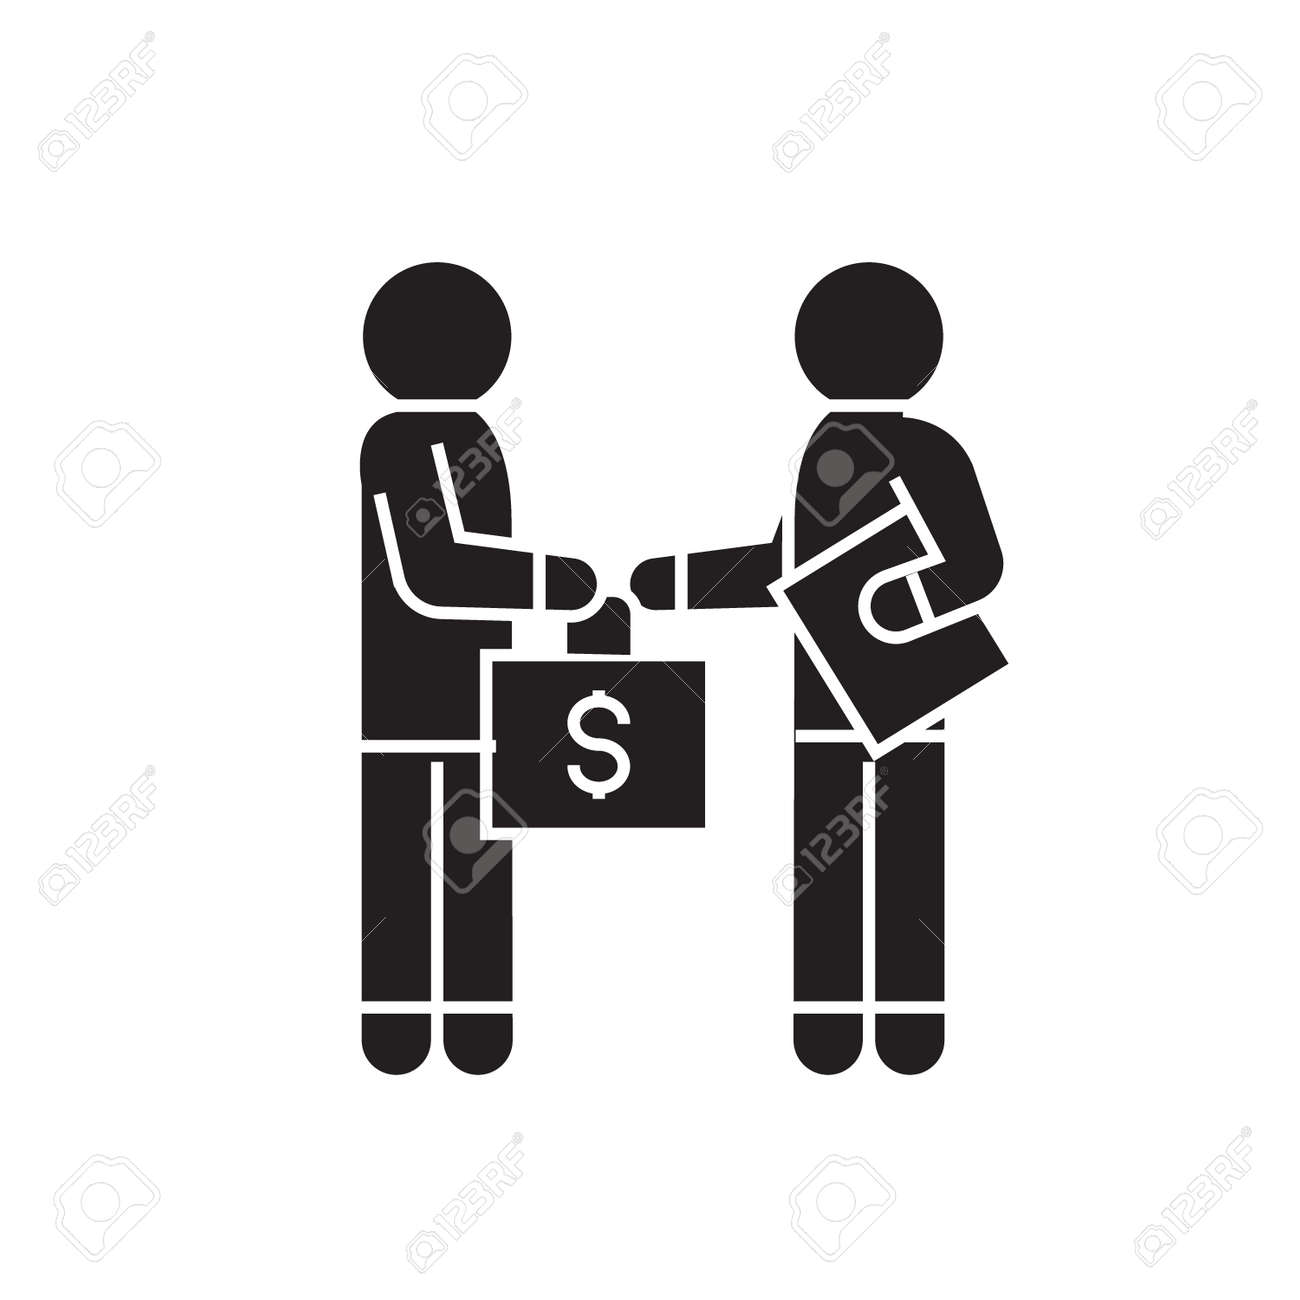 Bribery and corruption, man giving money black vector concept icon. Bribery and corruption, man giving money flat illustration, sign, symbol - 126905872